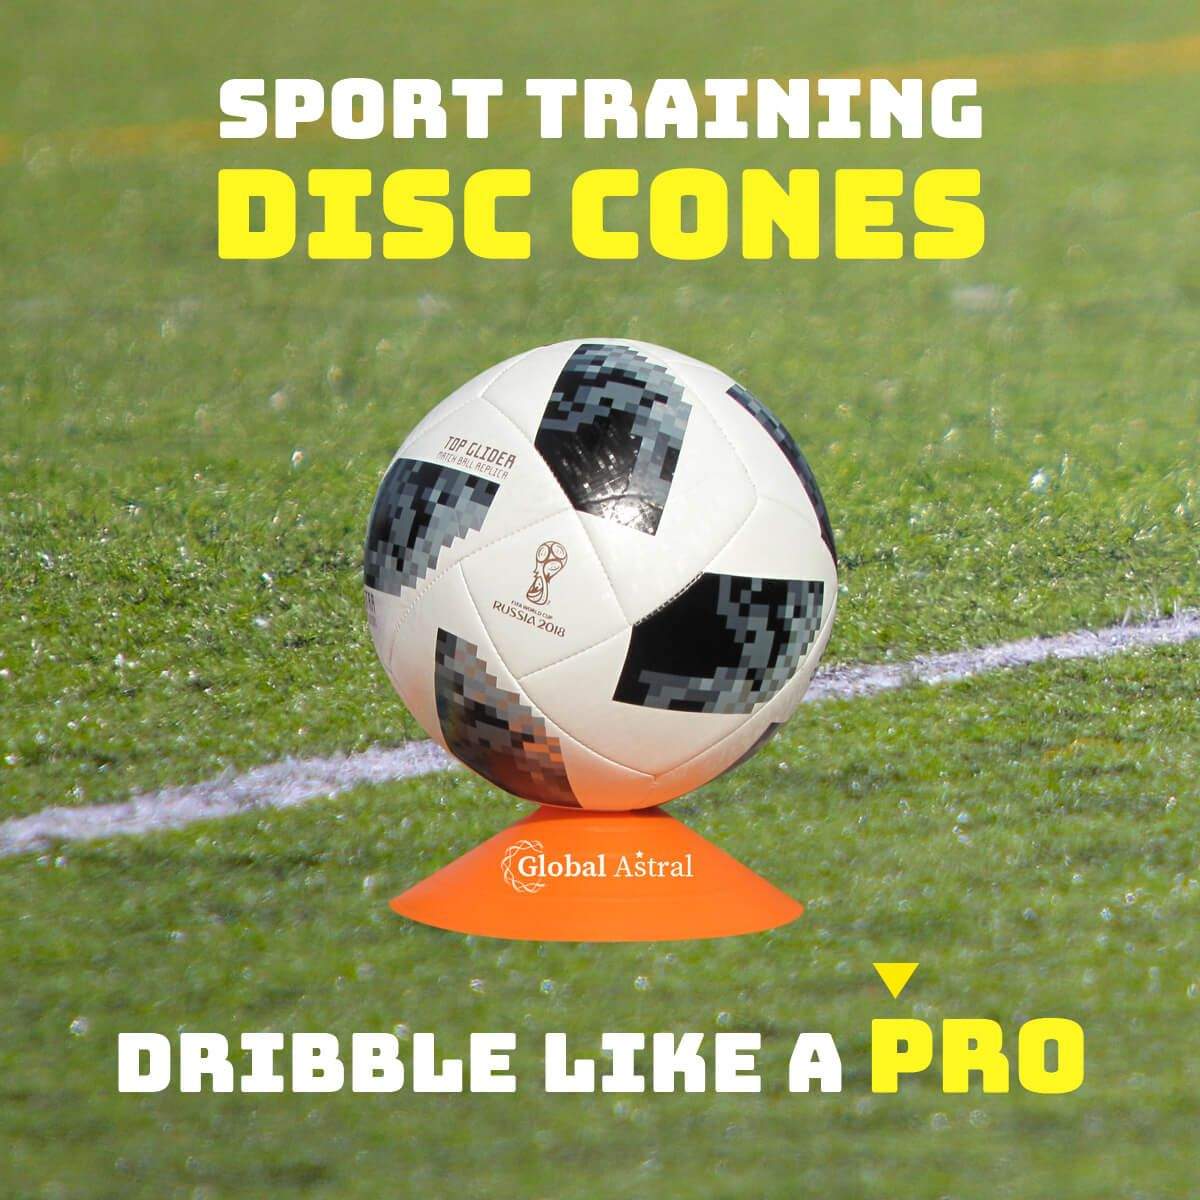 Dribble Like A Pro Soccer Training Equipment Soccer Training Soccer Drills